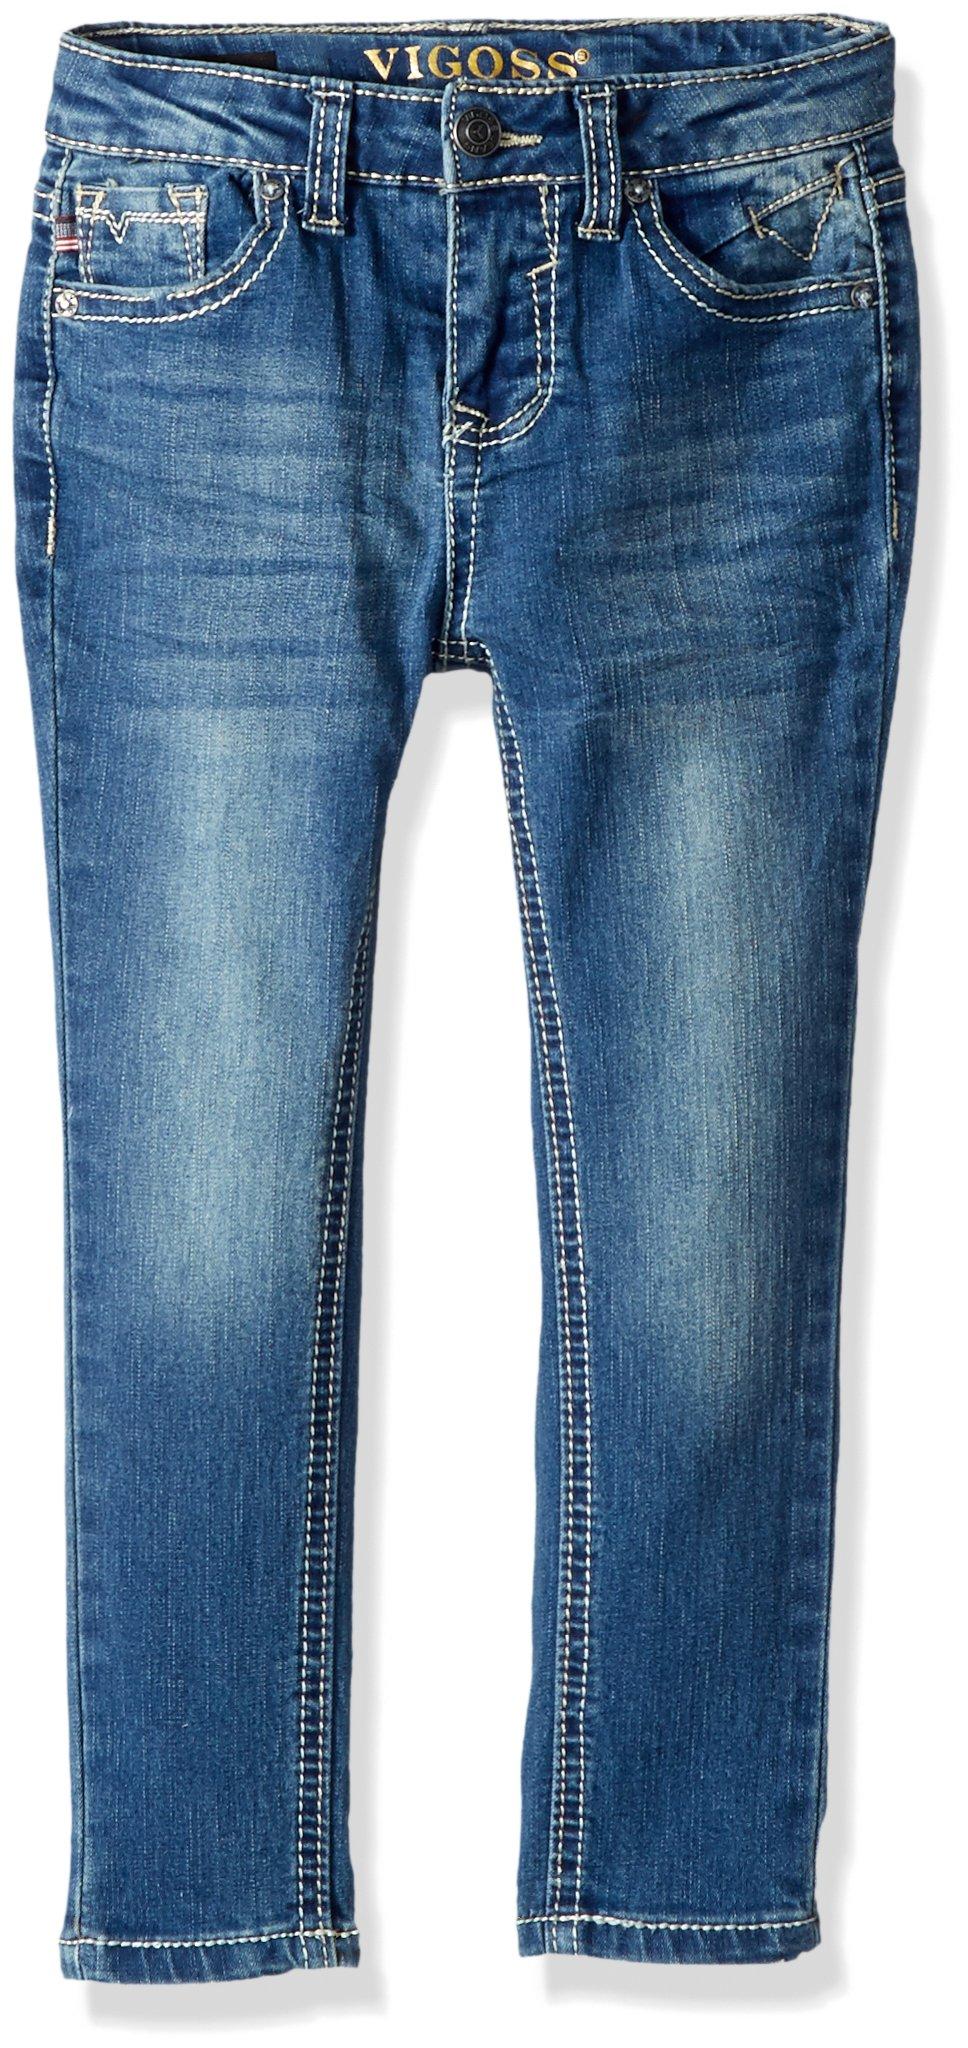 VIGOSS Girls' Little Back Pocket Jean, Vespa, 4